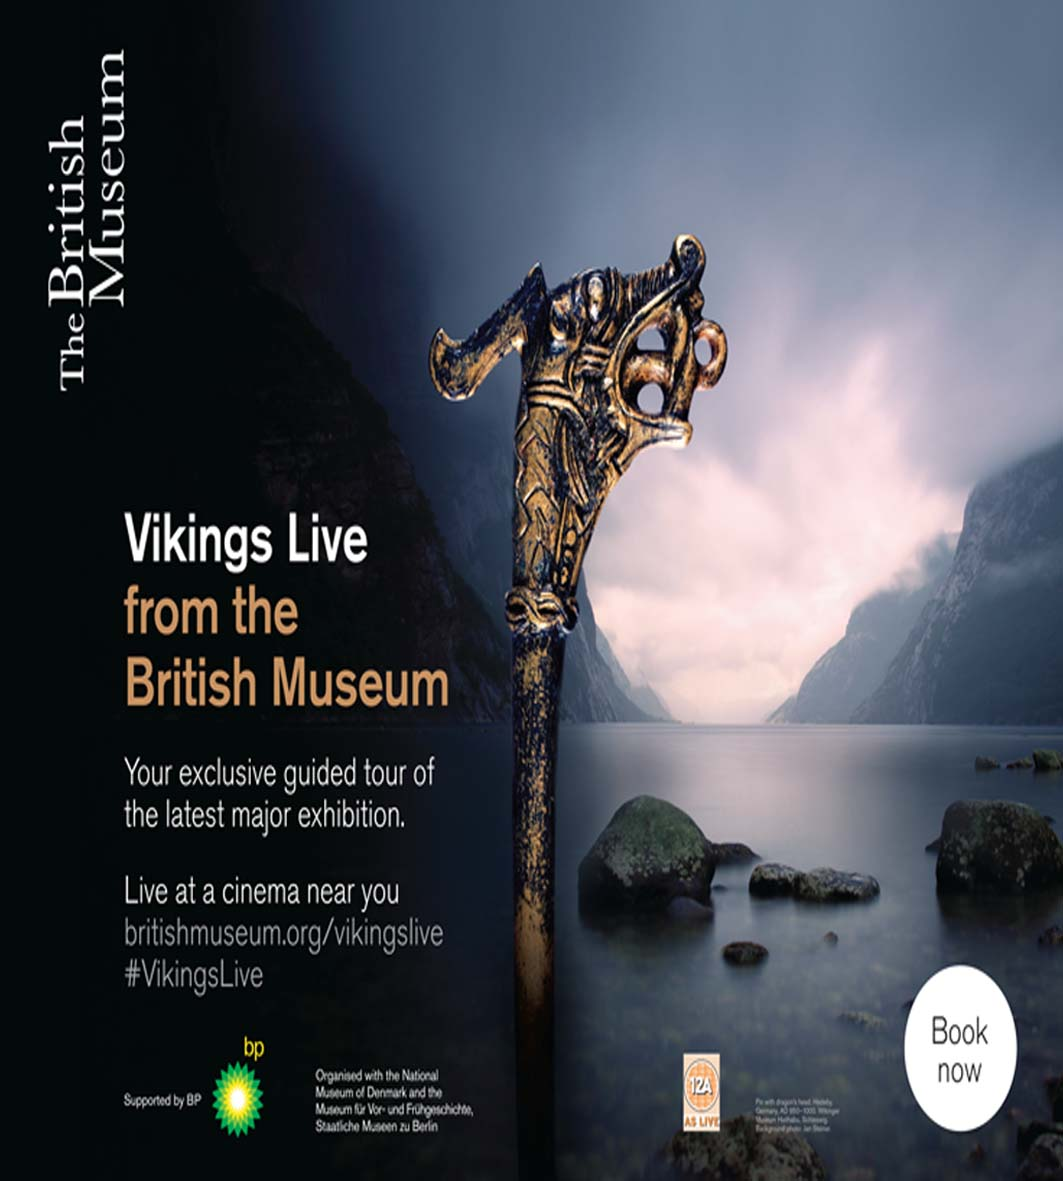 Vikings Live